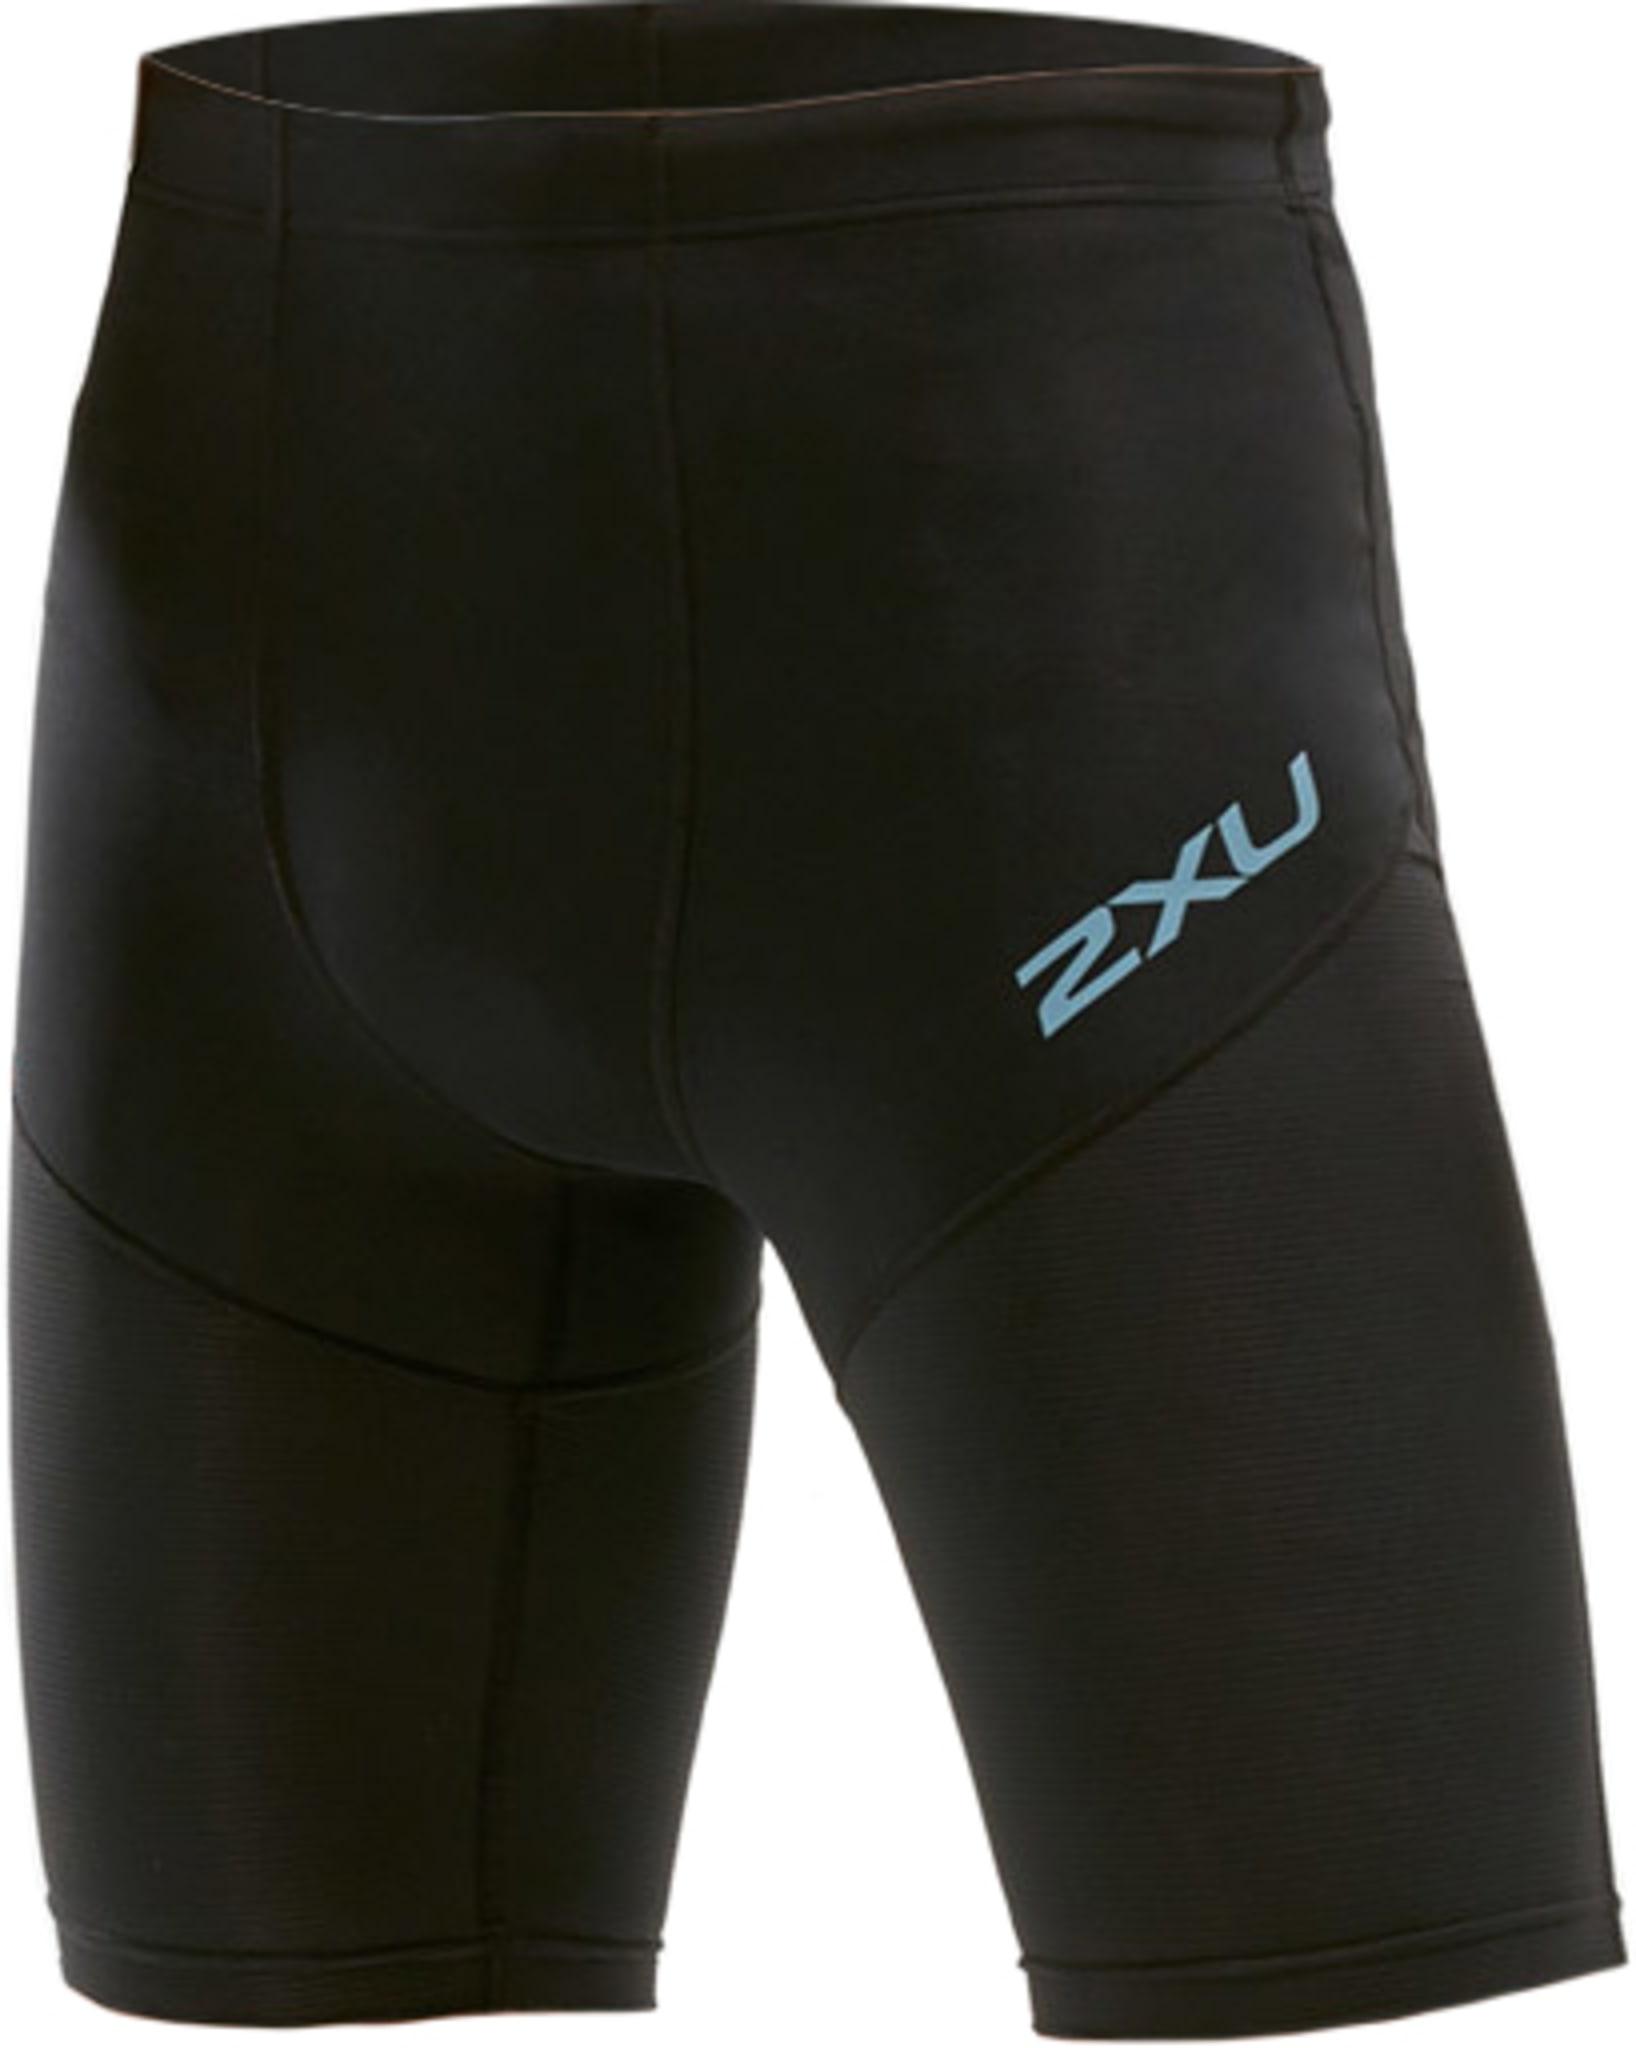 Run Dash Compression Shorts M